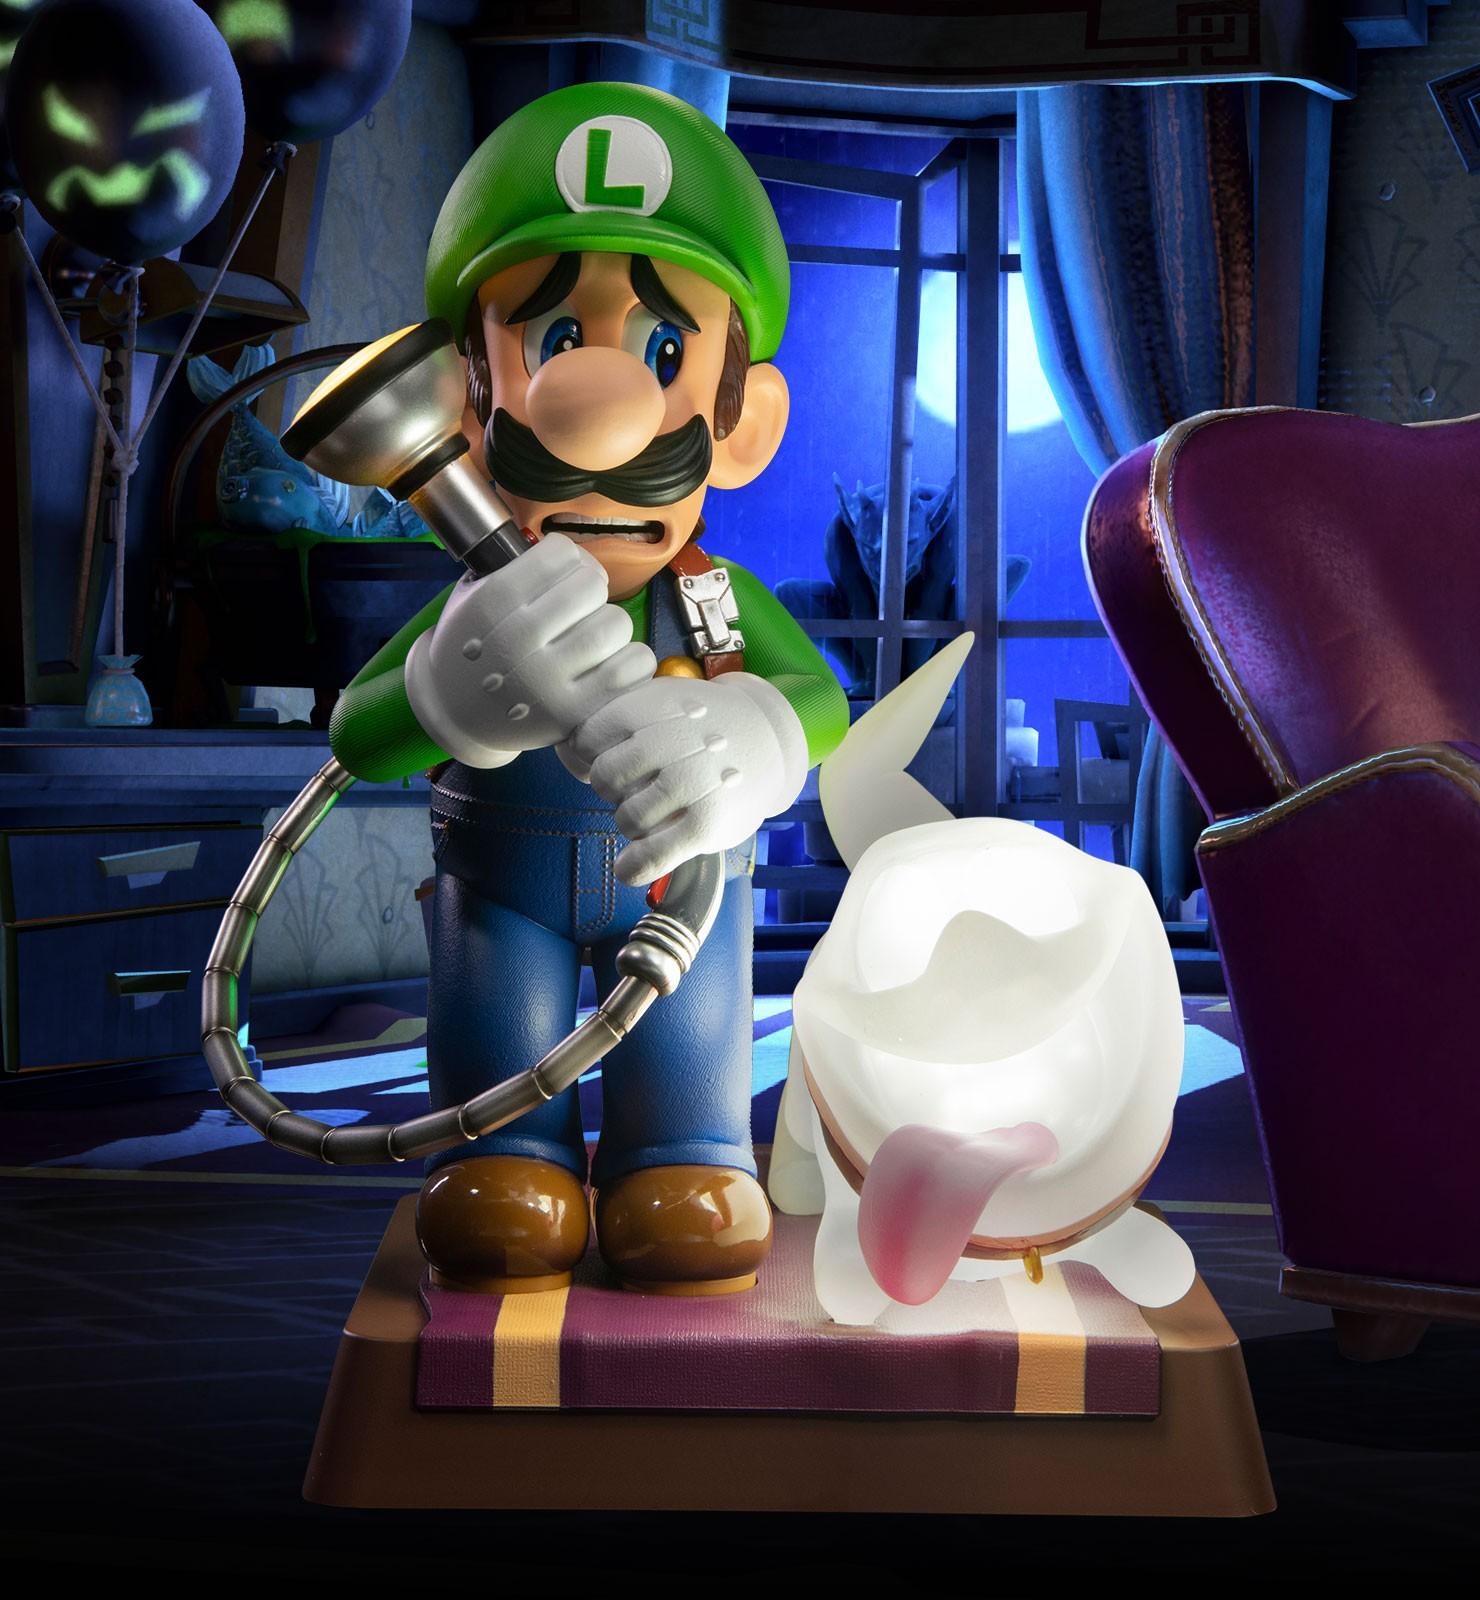 Luigi's Mansion™ 3 – Luigi and Polterpup